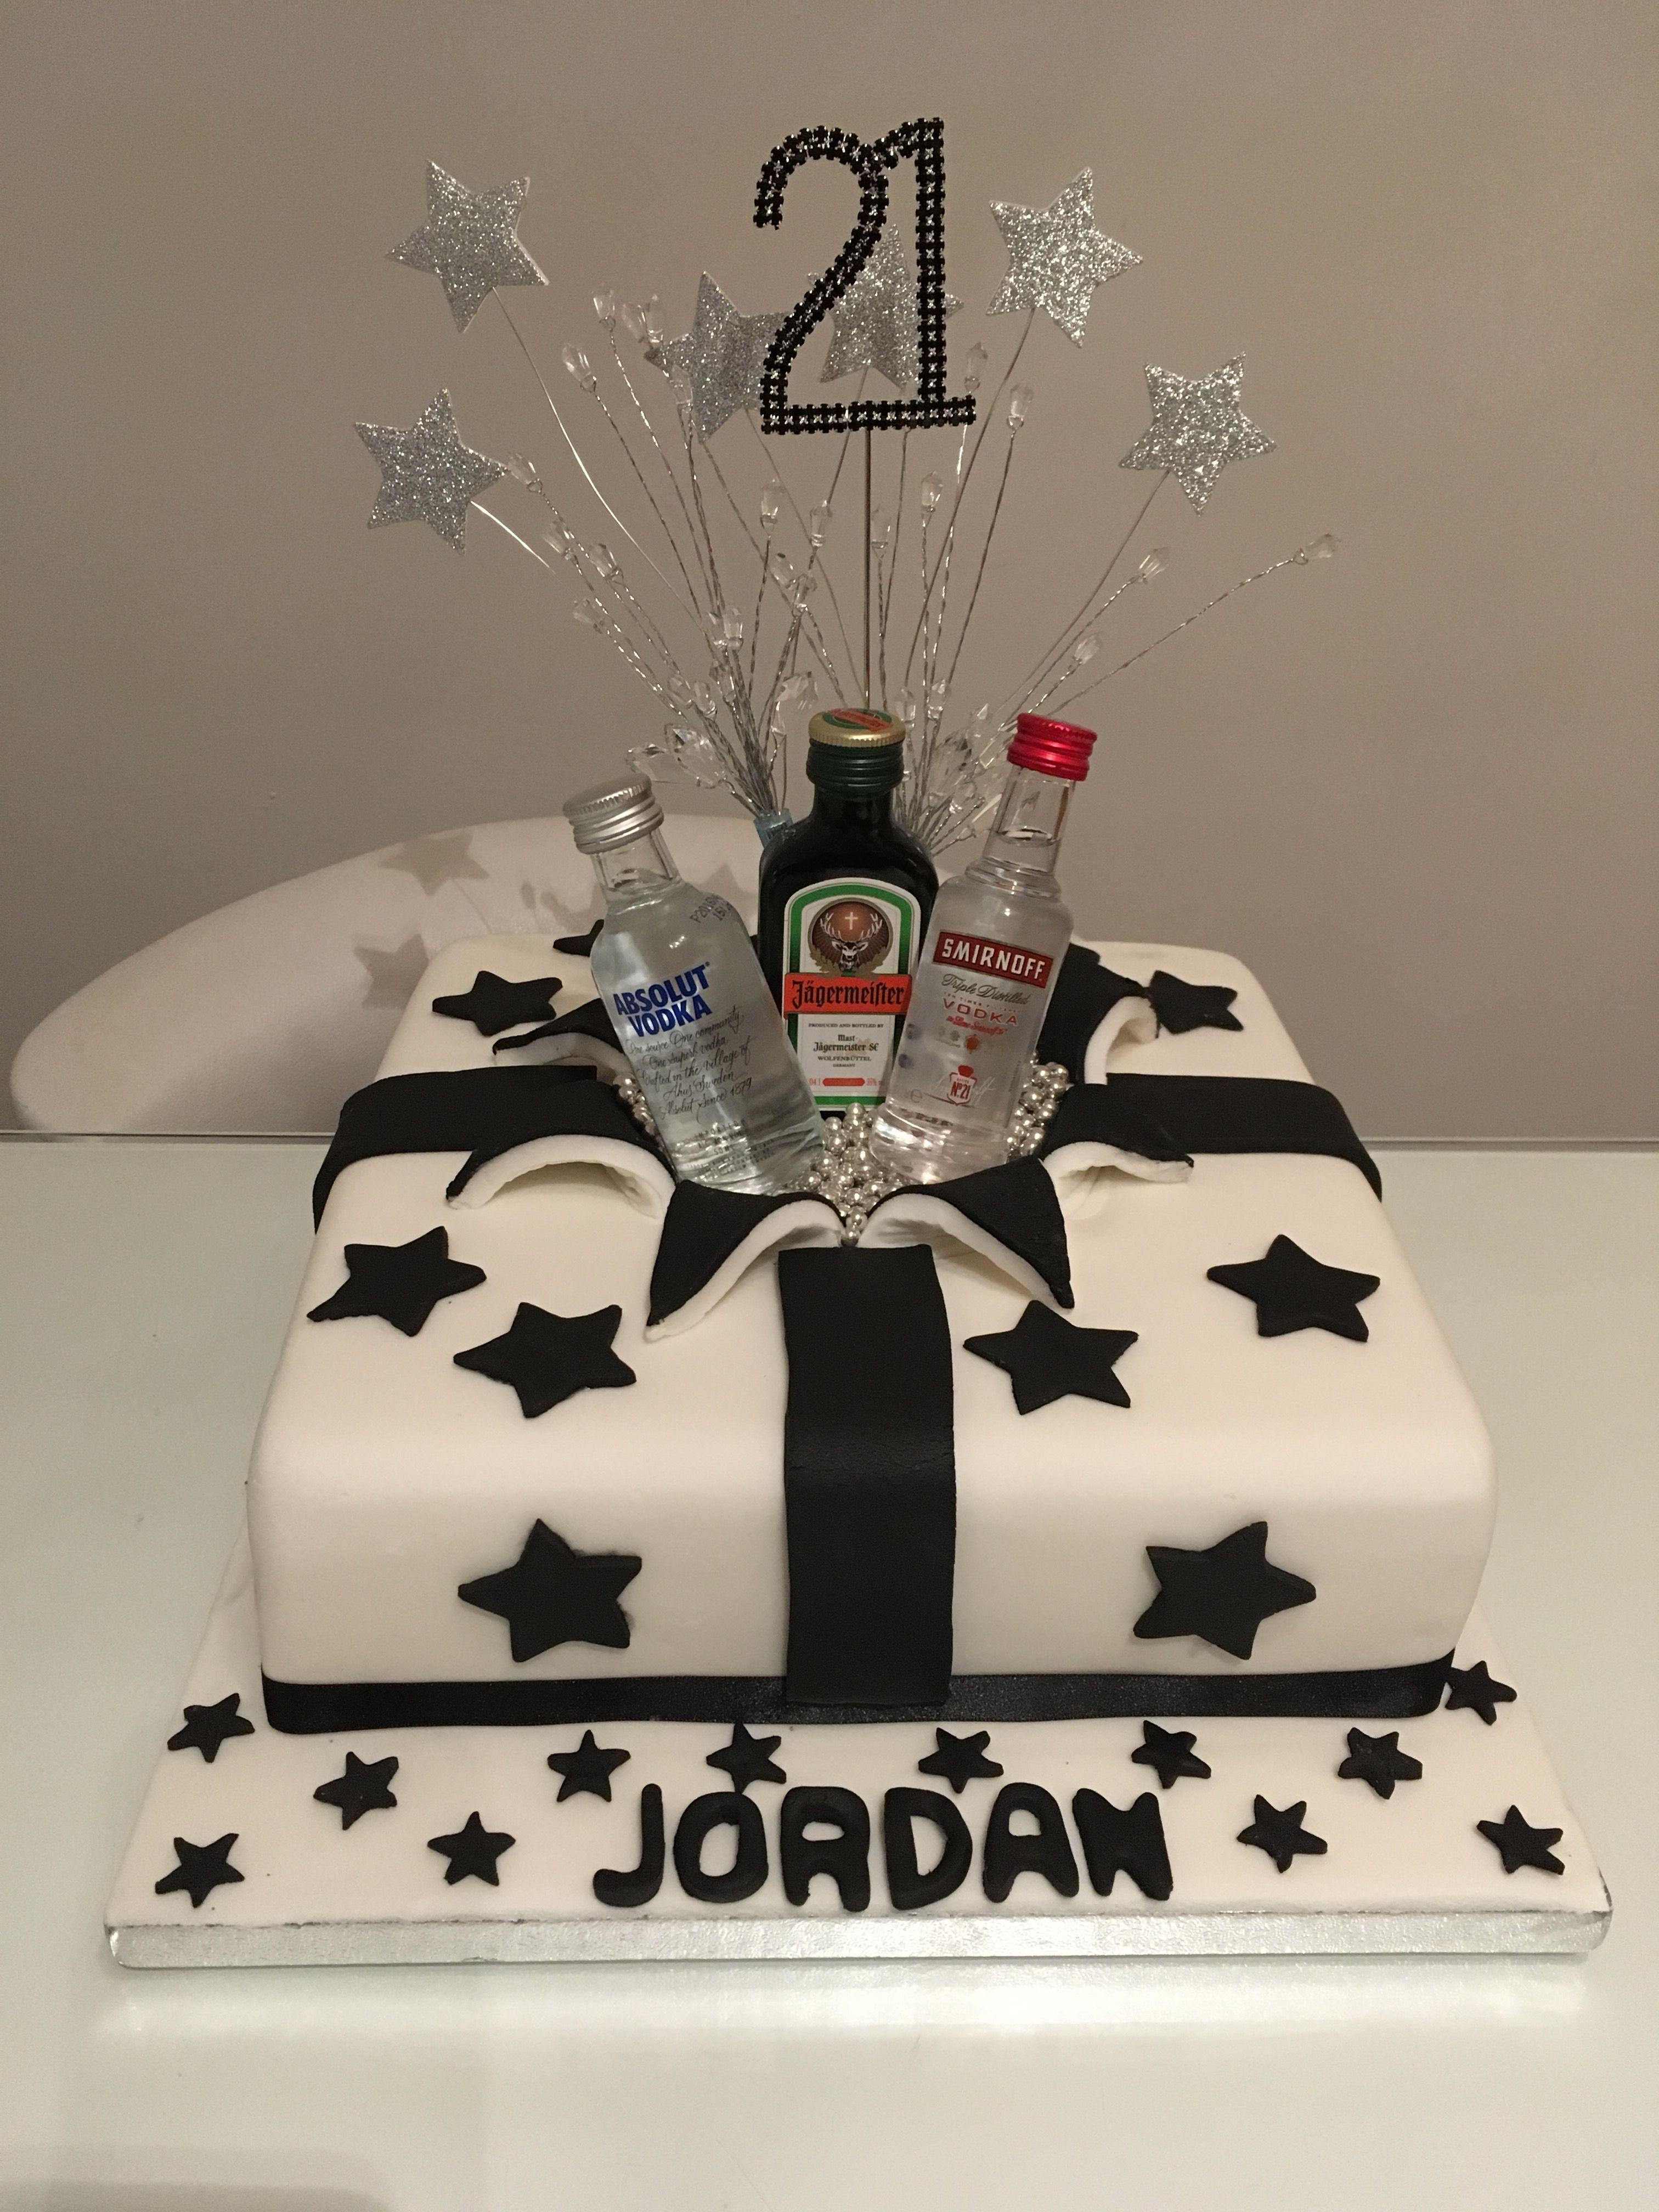 21st Birthday Cake Ideas For Him : birthday, ideas, Jordans, Birthday, Guys,, Cakes,, Toppers